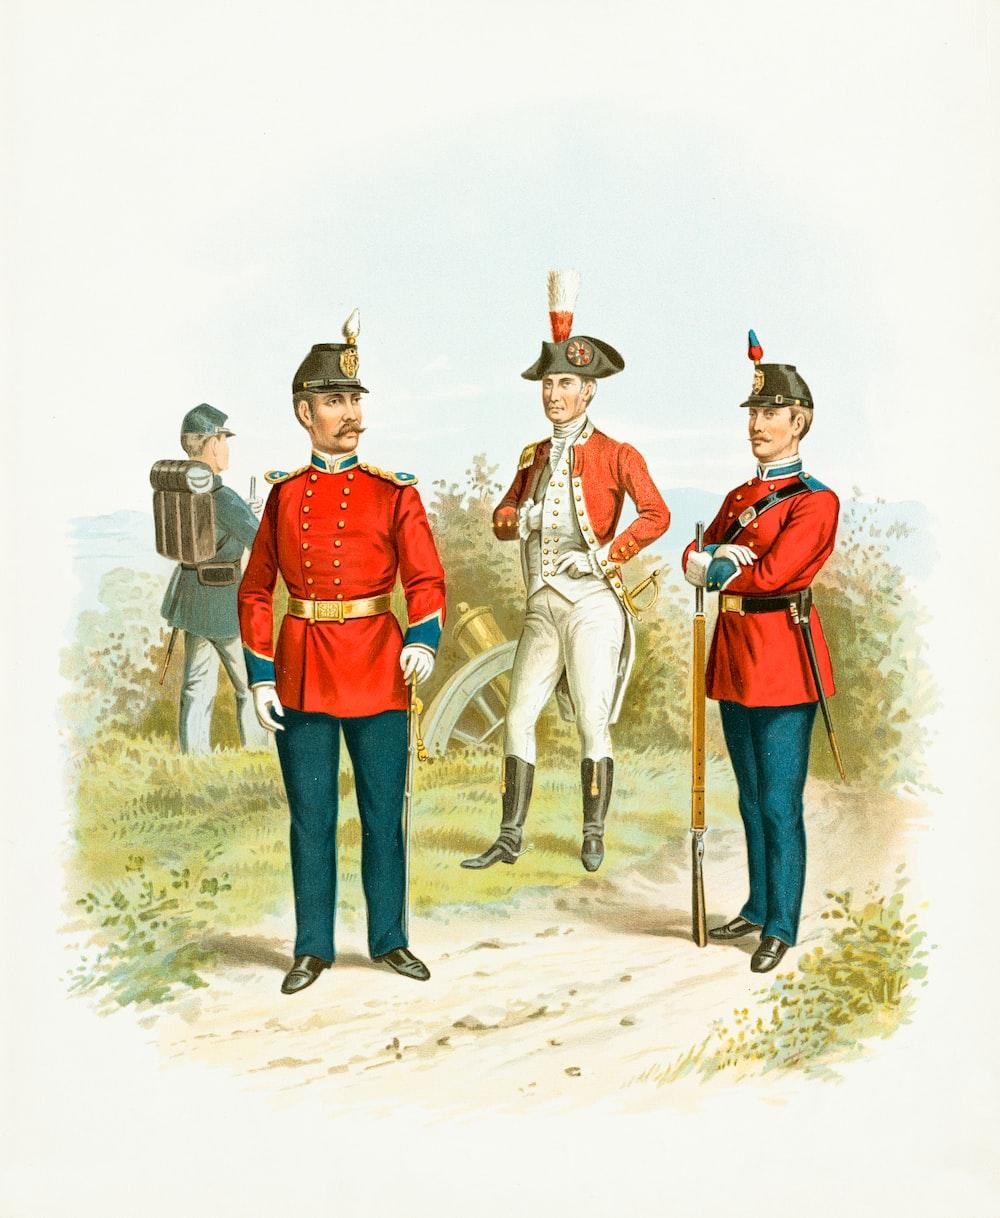 3 men in cowboy hat standing on sand